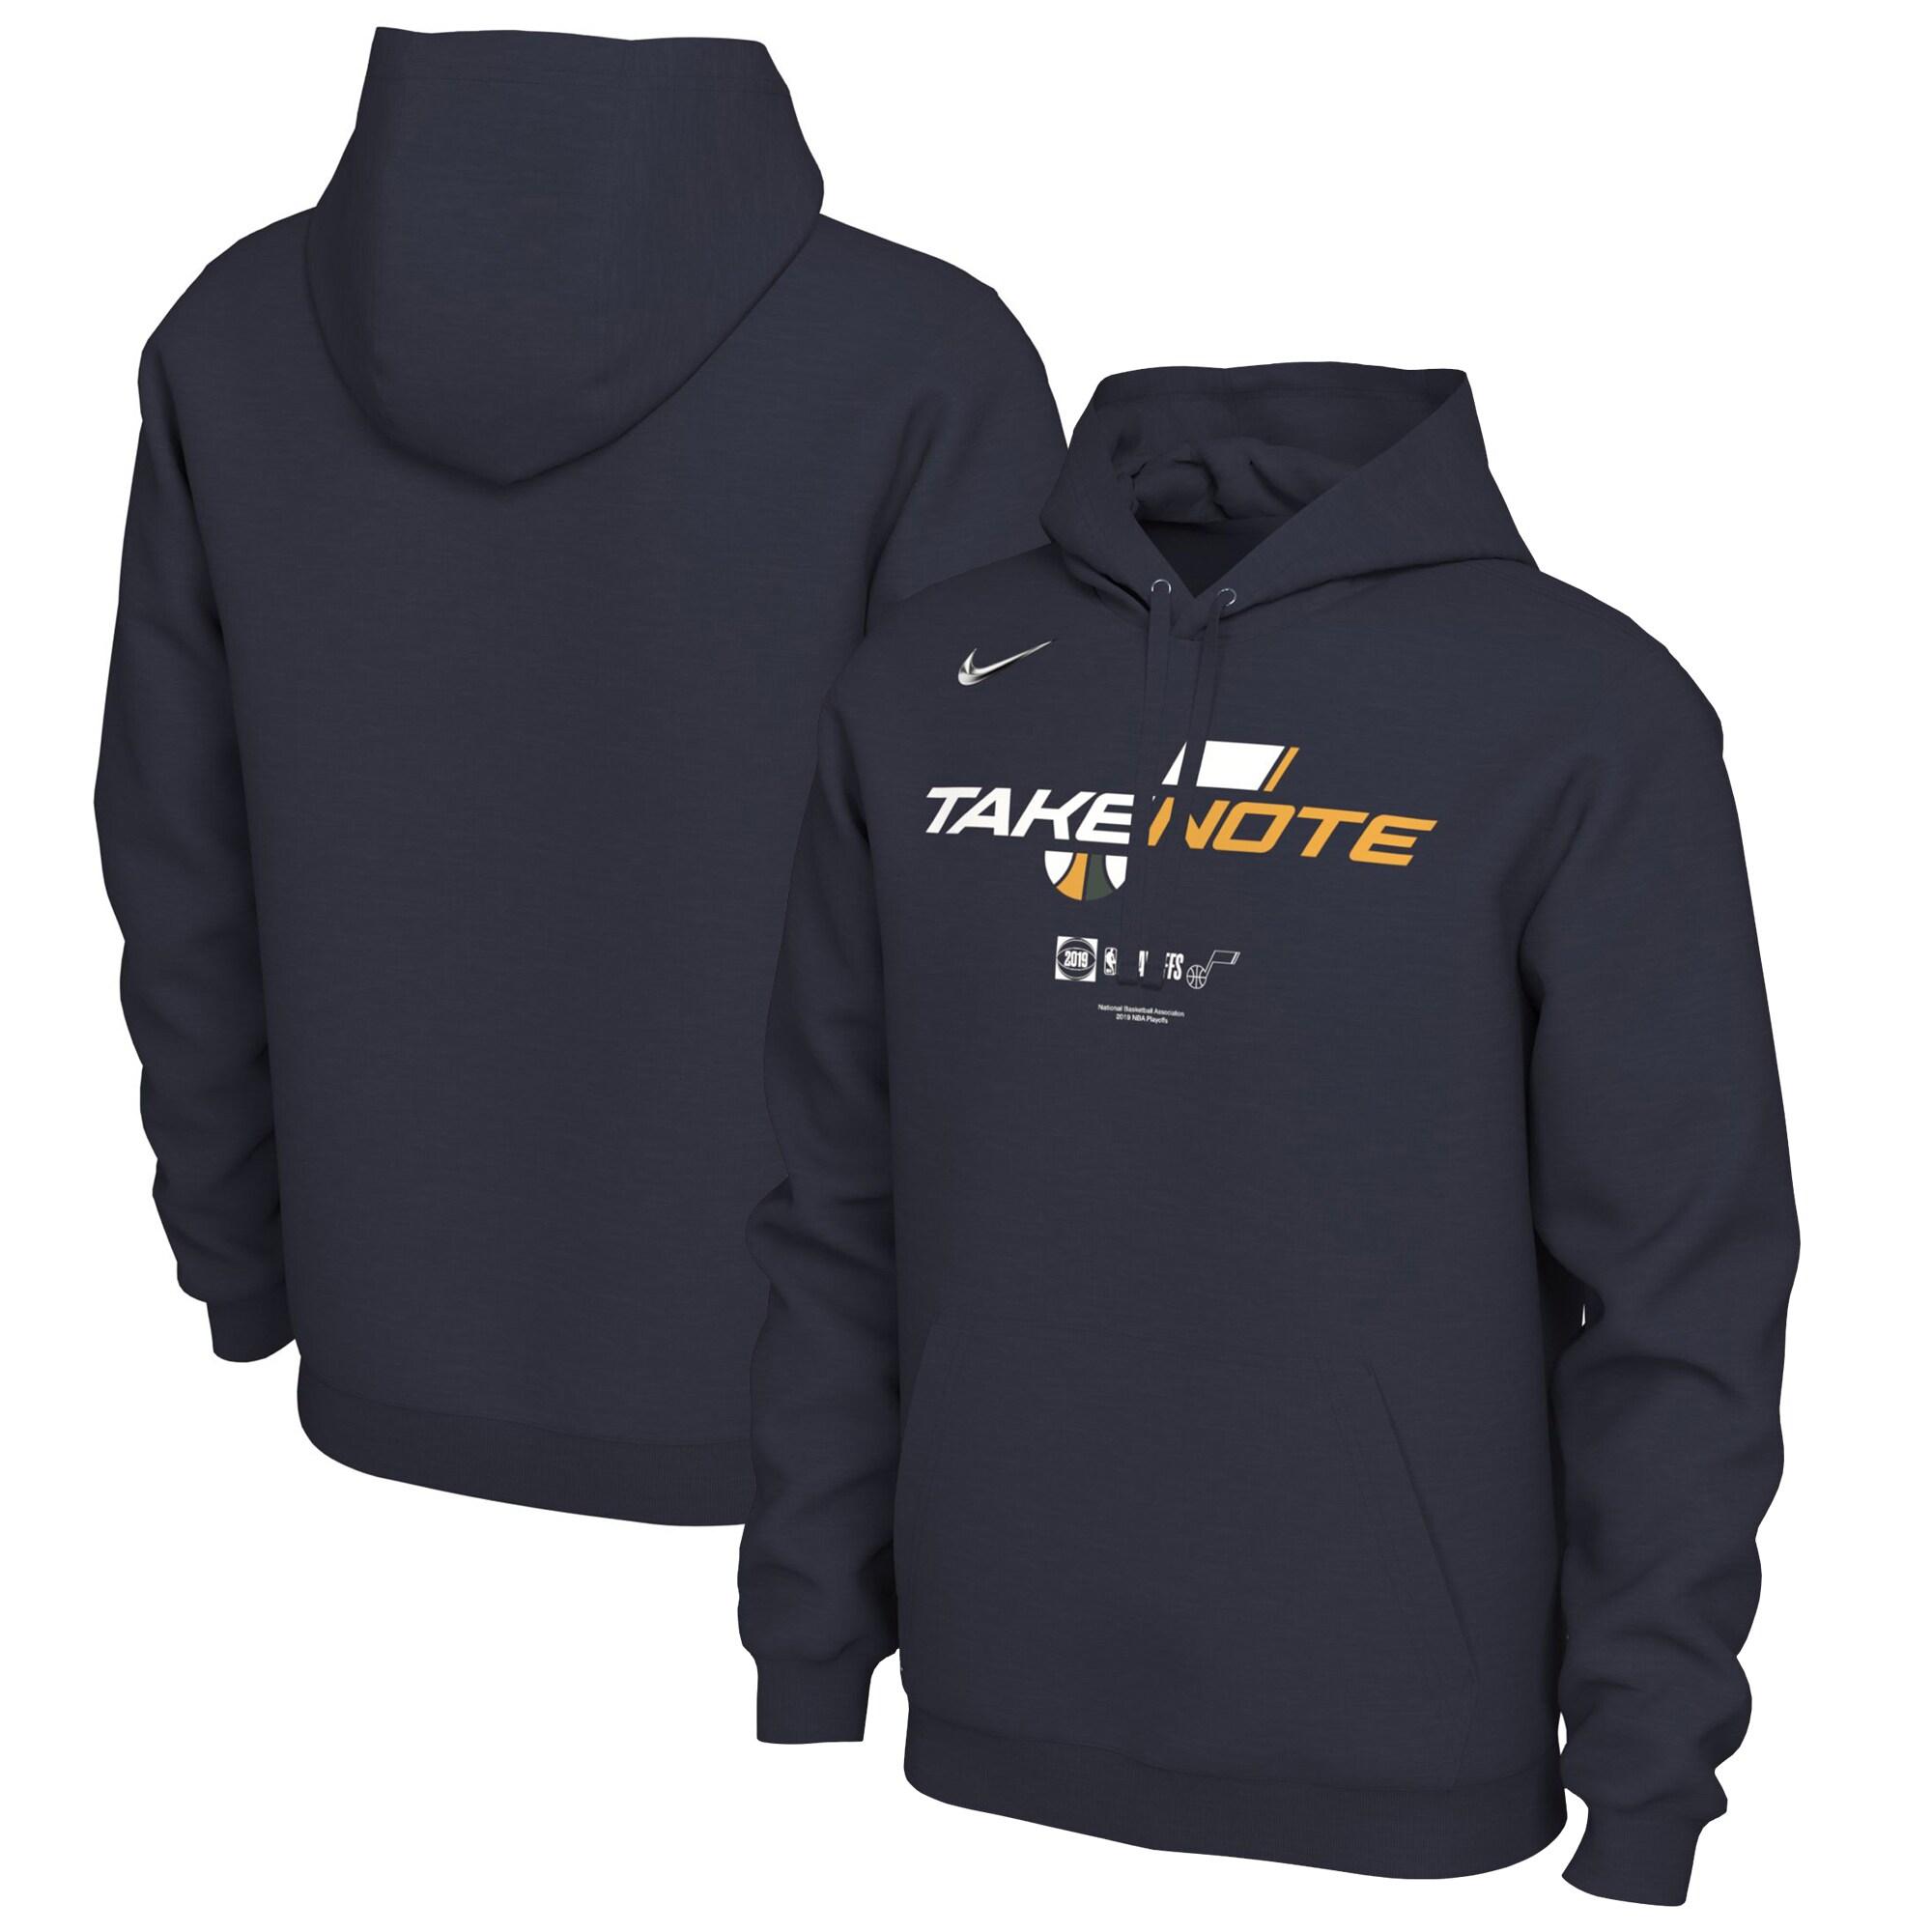 Utah Jazz Nike 2019 NBA Playoffs Bound Team Mantra Pullover Hoodie - Navy